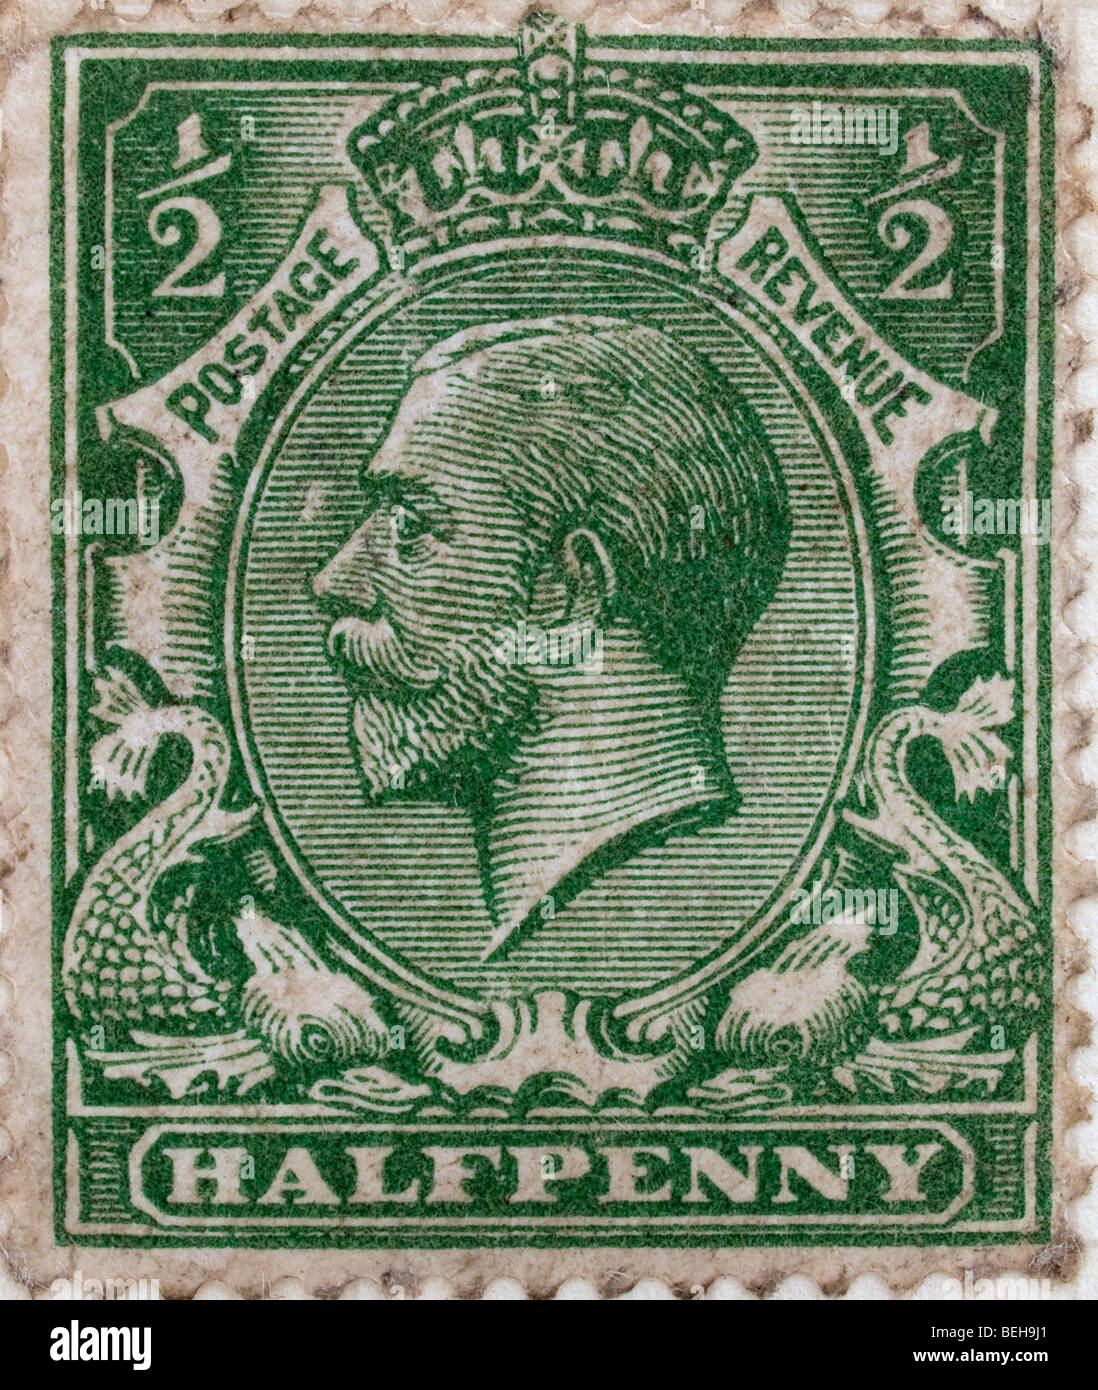 Halfpenny Green Stamp Stock Photo 26196297 Alamy